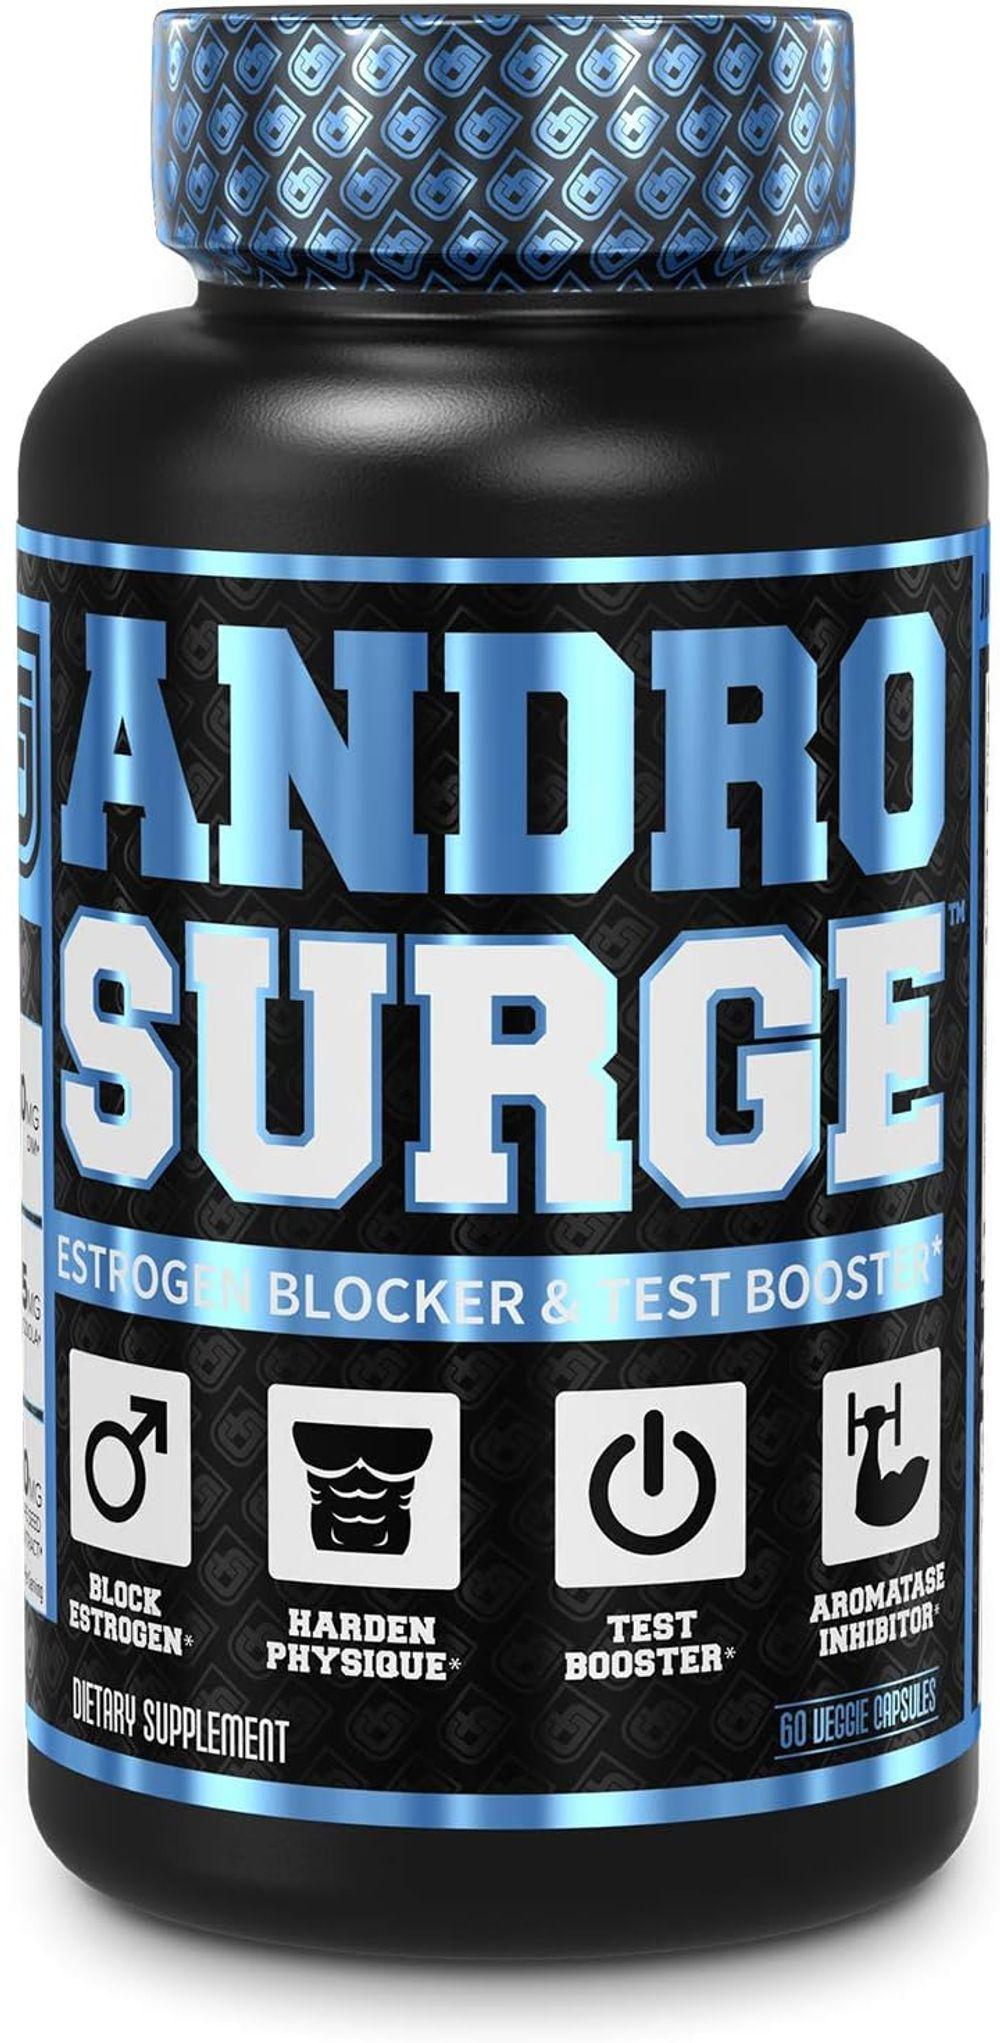 Androsurge Estrogen Blocker for Men - Natural Anti-Estrogen, Testosterone Booster & Aromatase Inhibitor Supplement - Boost Muscle Growth & Fat Loss - DIM & 6 More Powerful Ingredients, 60 Veggie Pills